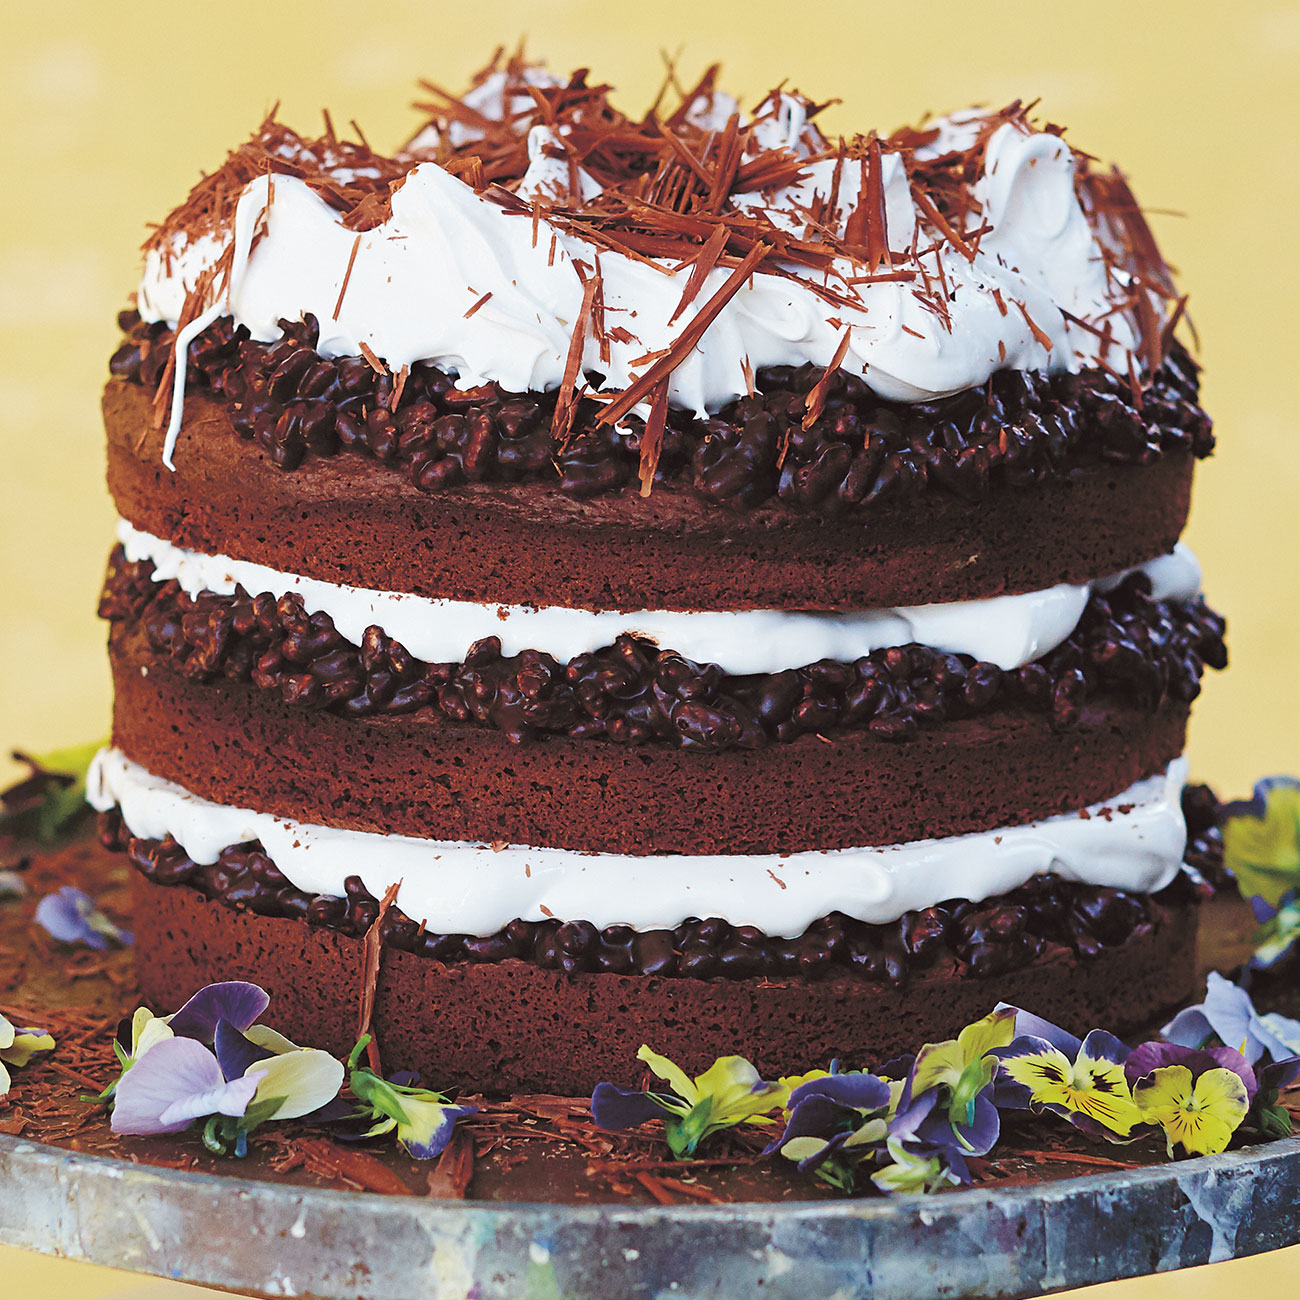 Celebration Cake Recipes: Jamie's Chocolate Celebration Cake Recipe